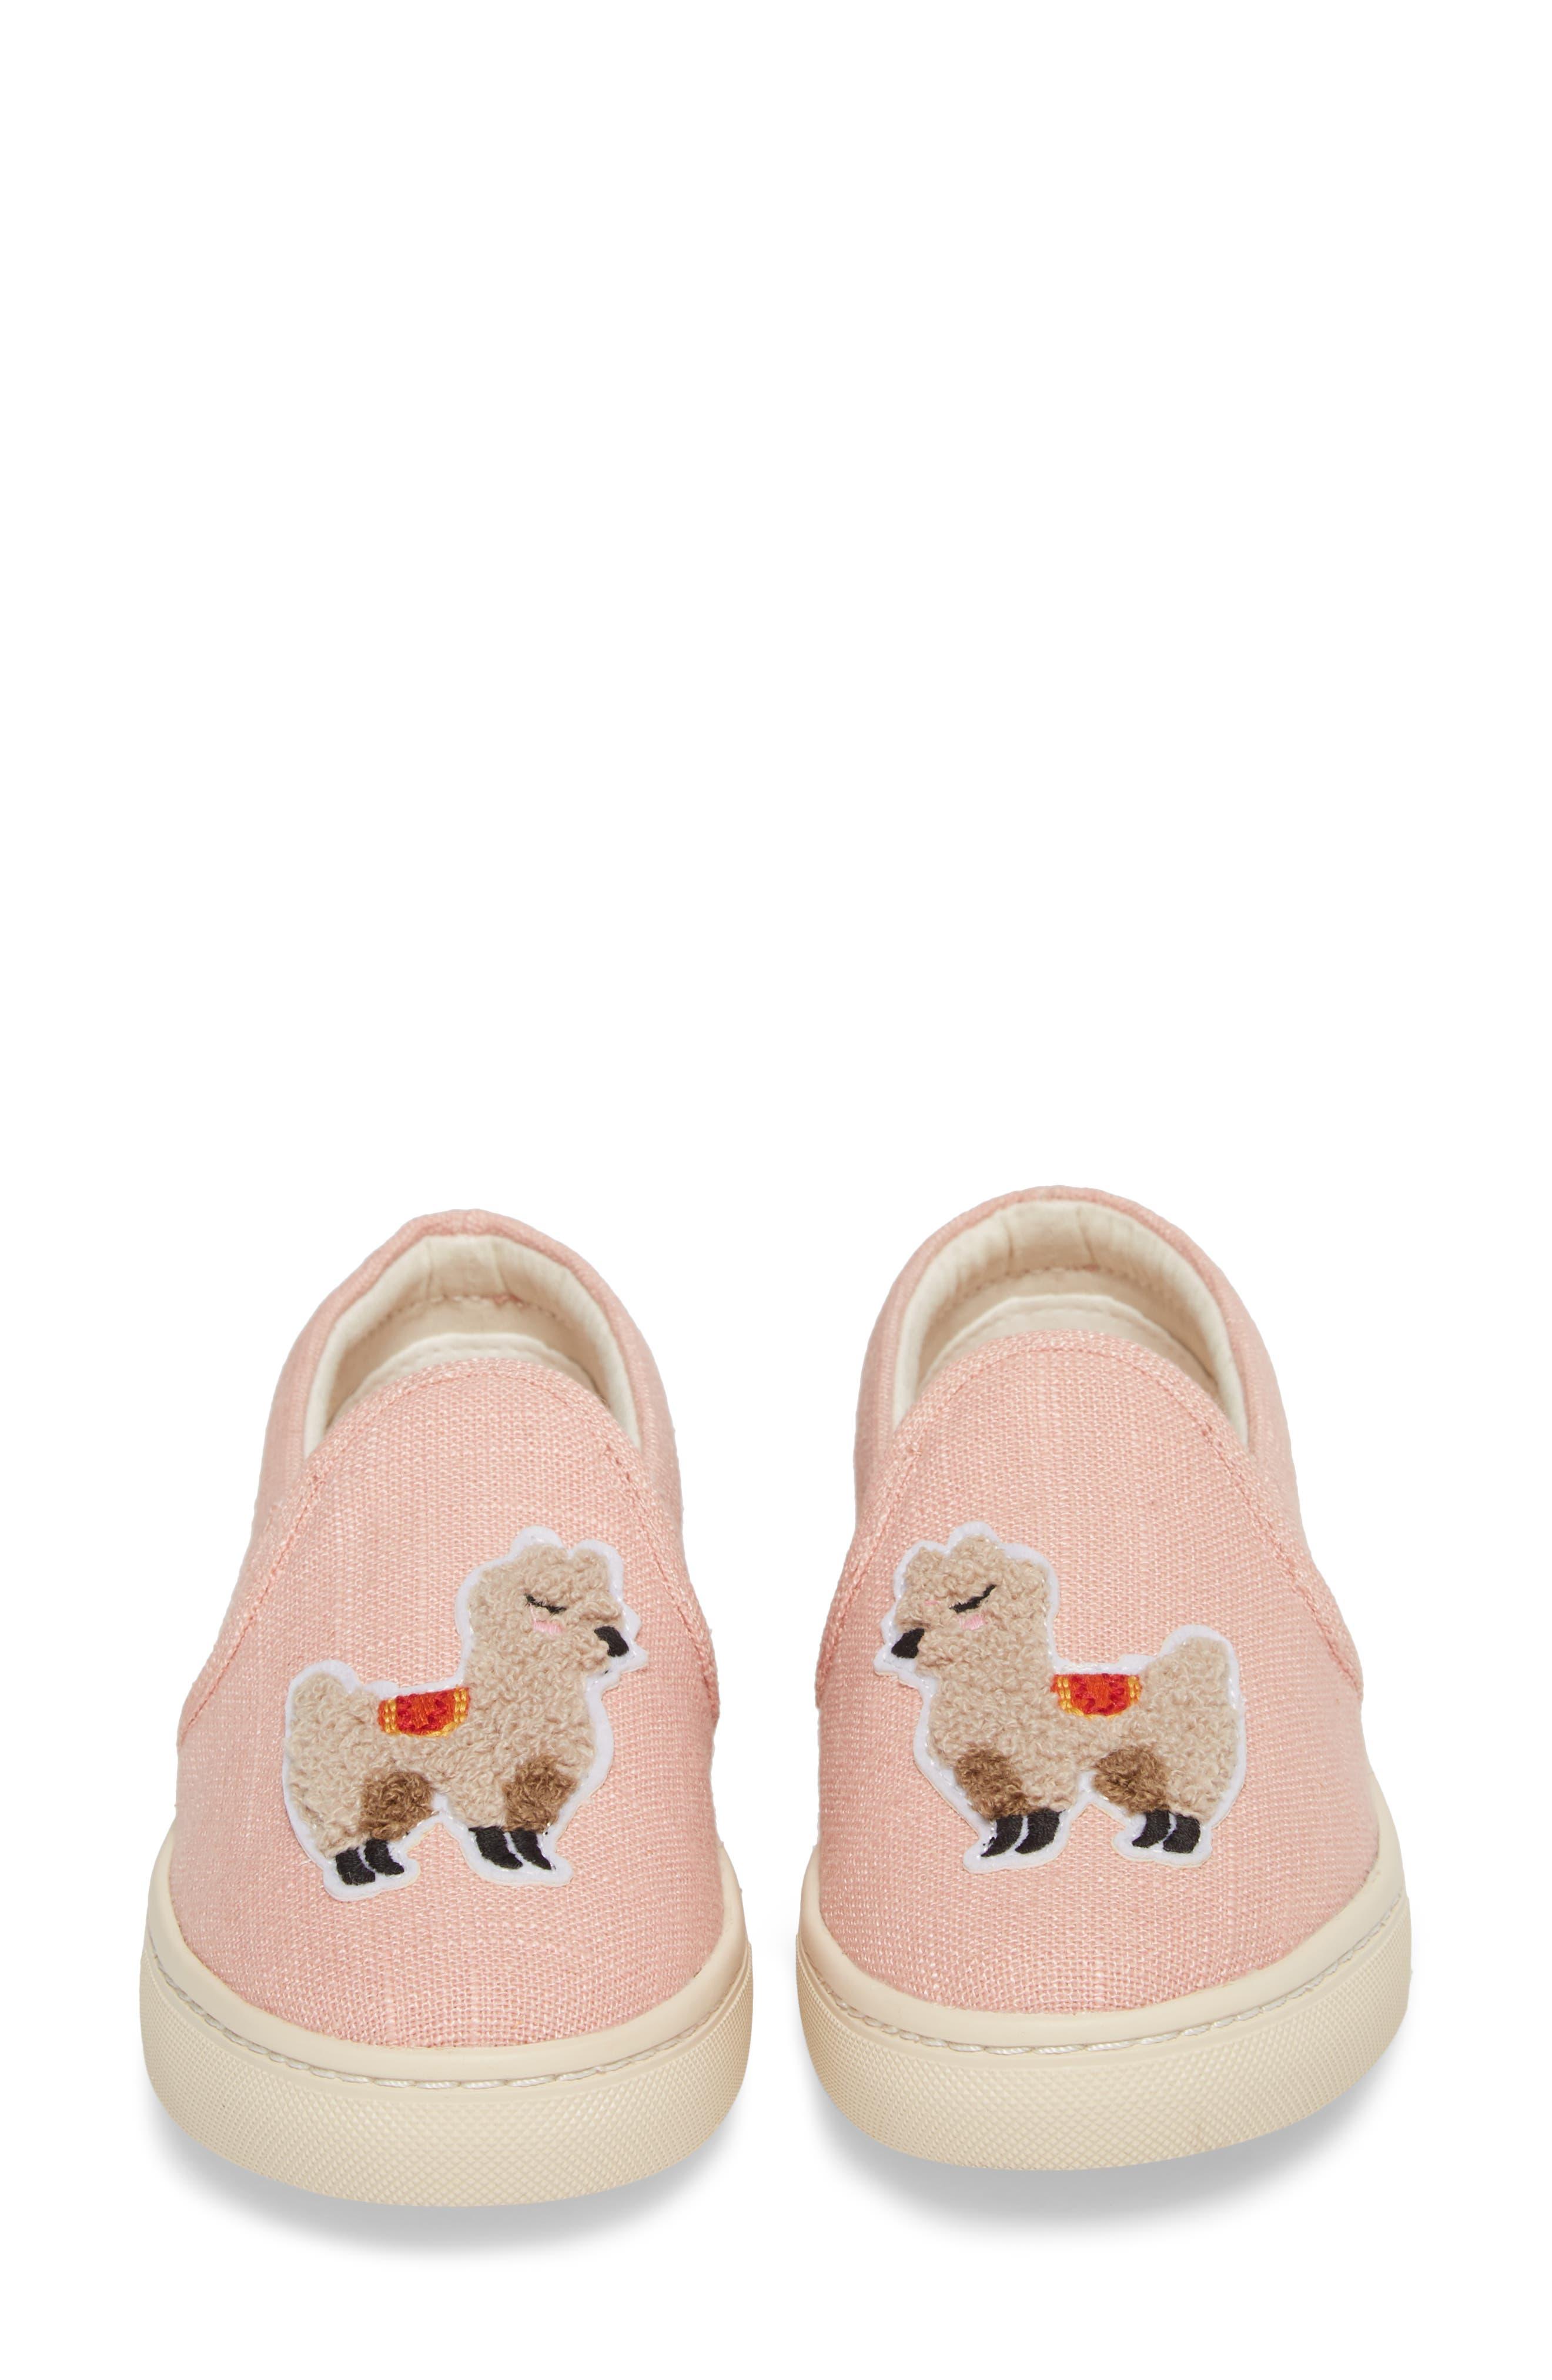 Llama Slip-On Sneaker,                             Alternate thumbnail 5, color,                             Dusty Rose Fabric